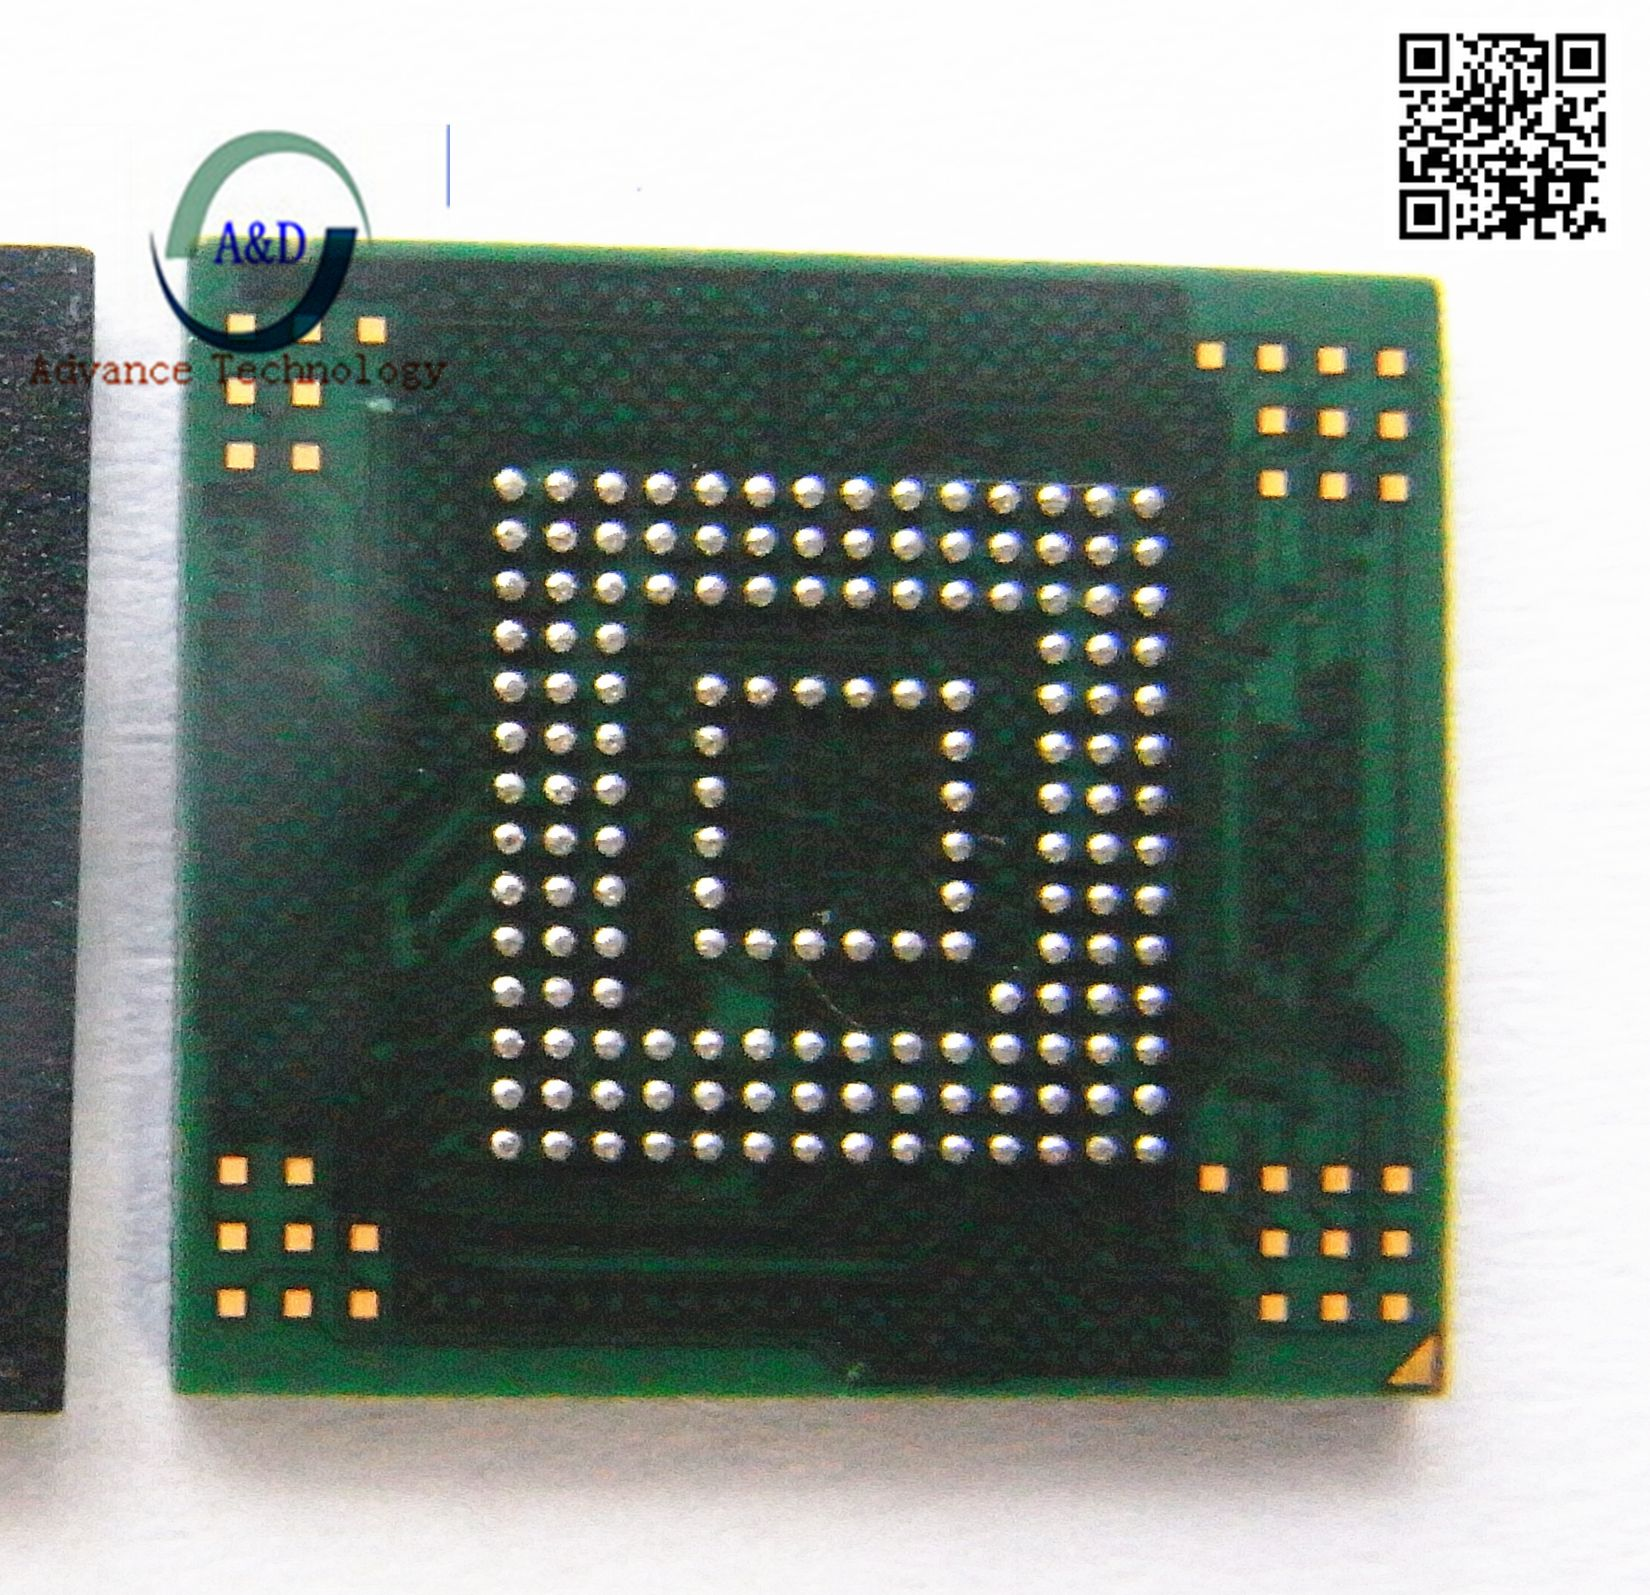 1 PCS Programmé meilleur prix pour N7100 KMVTU000LM-B503 mémoire flash IC KMV3W000LM-B310 MEM avec firmware